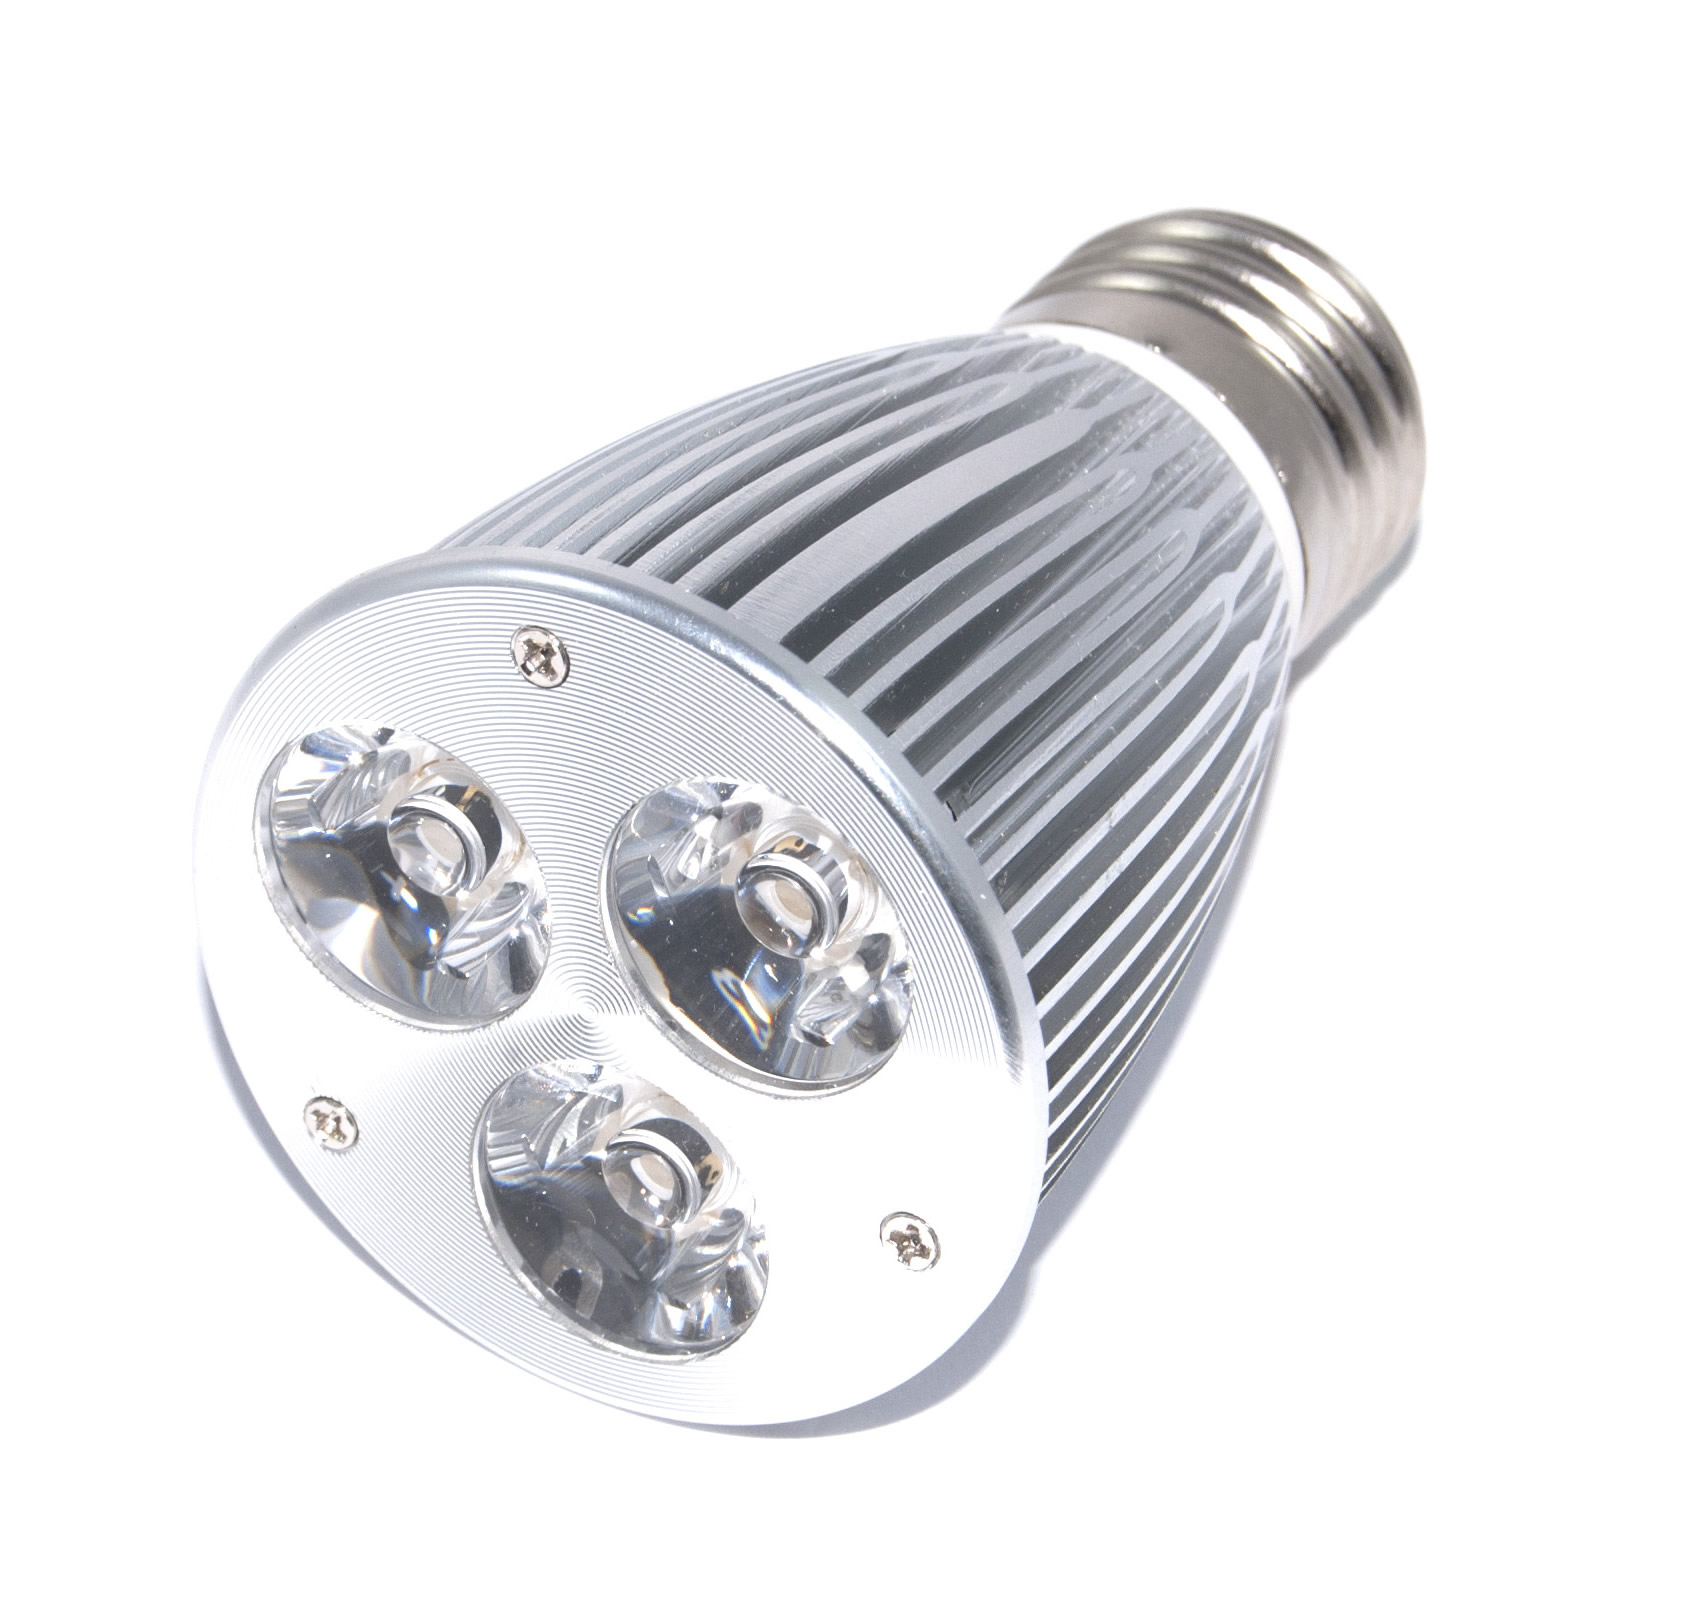 E27 power led lampen powerled verlichting e27 power led lampen parisarafo Choice Image